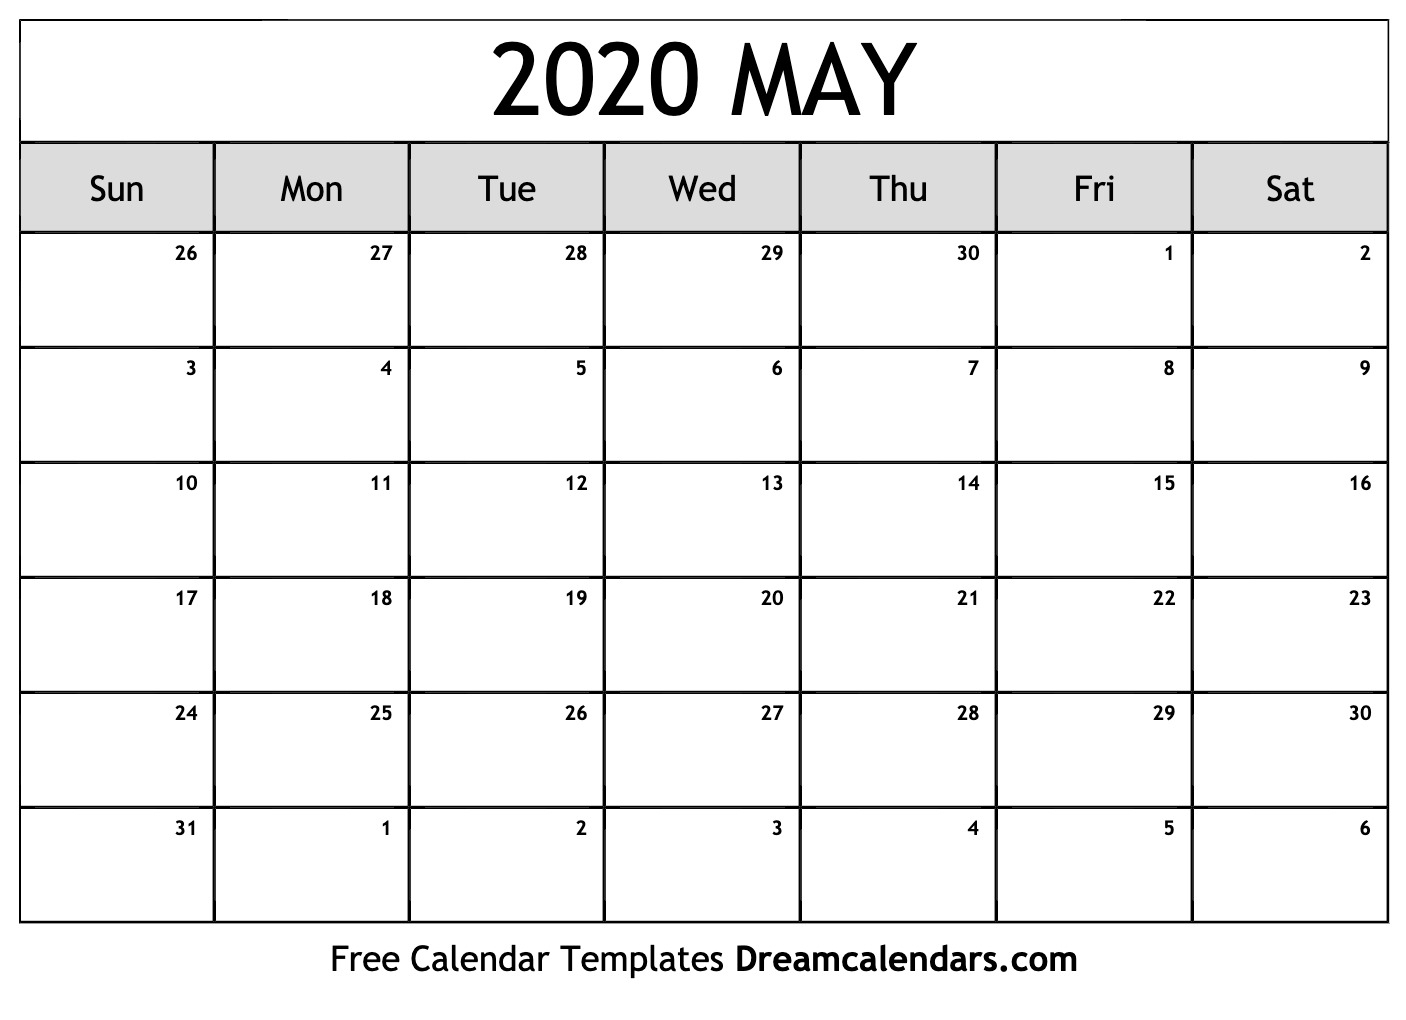 May Calendar 2020 - Wpa.wpart.co